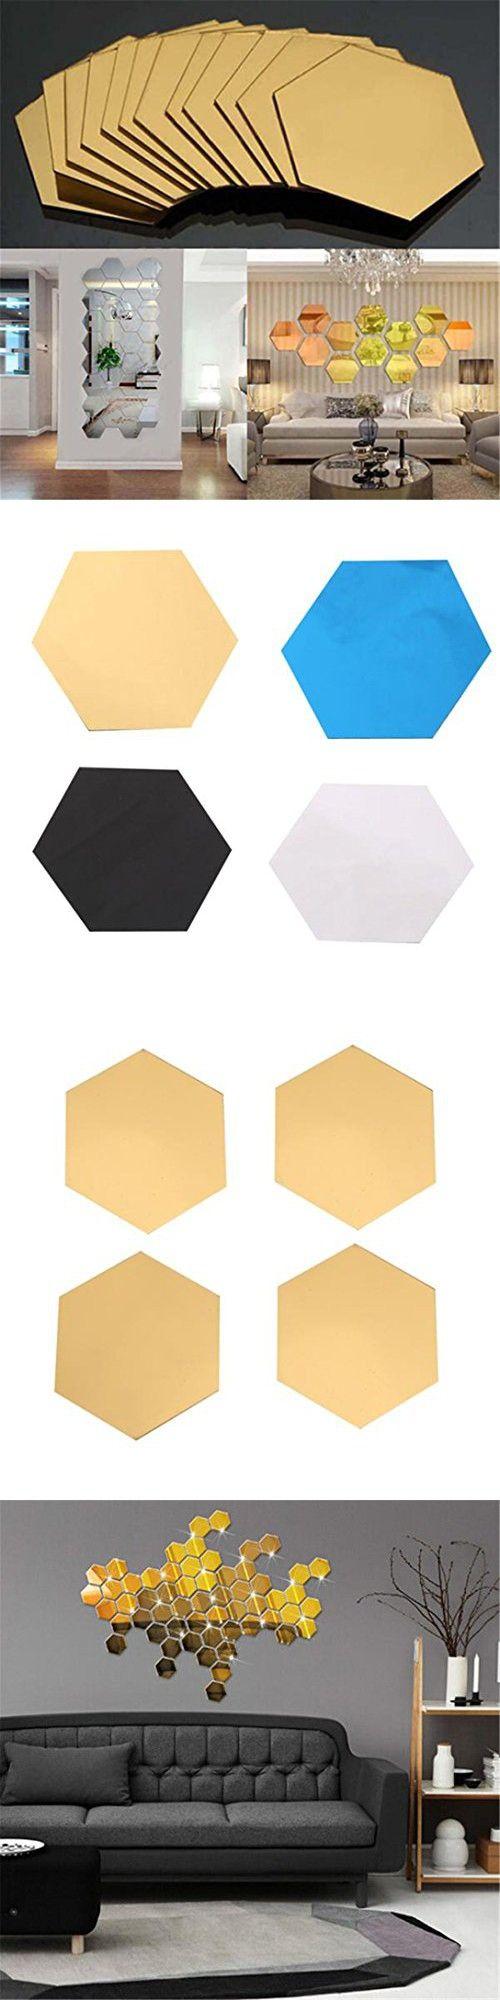 GUAngqi 12Pcs Luxury Wall Sticker DIY 3D Mirror Hexagon Vinyl Removable Home Decor